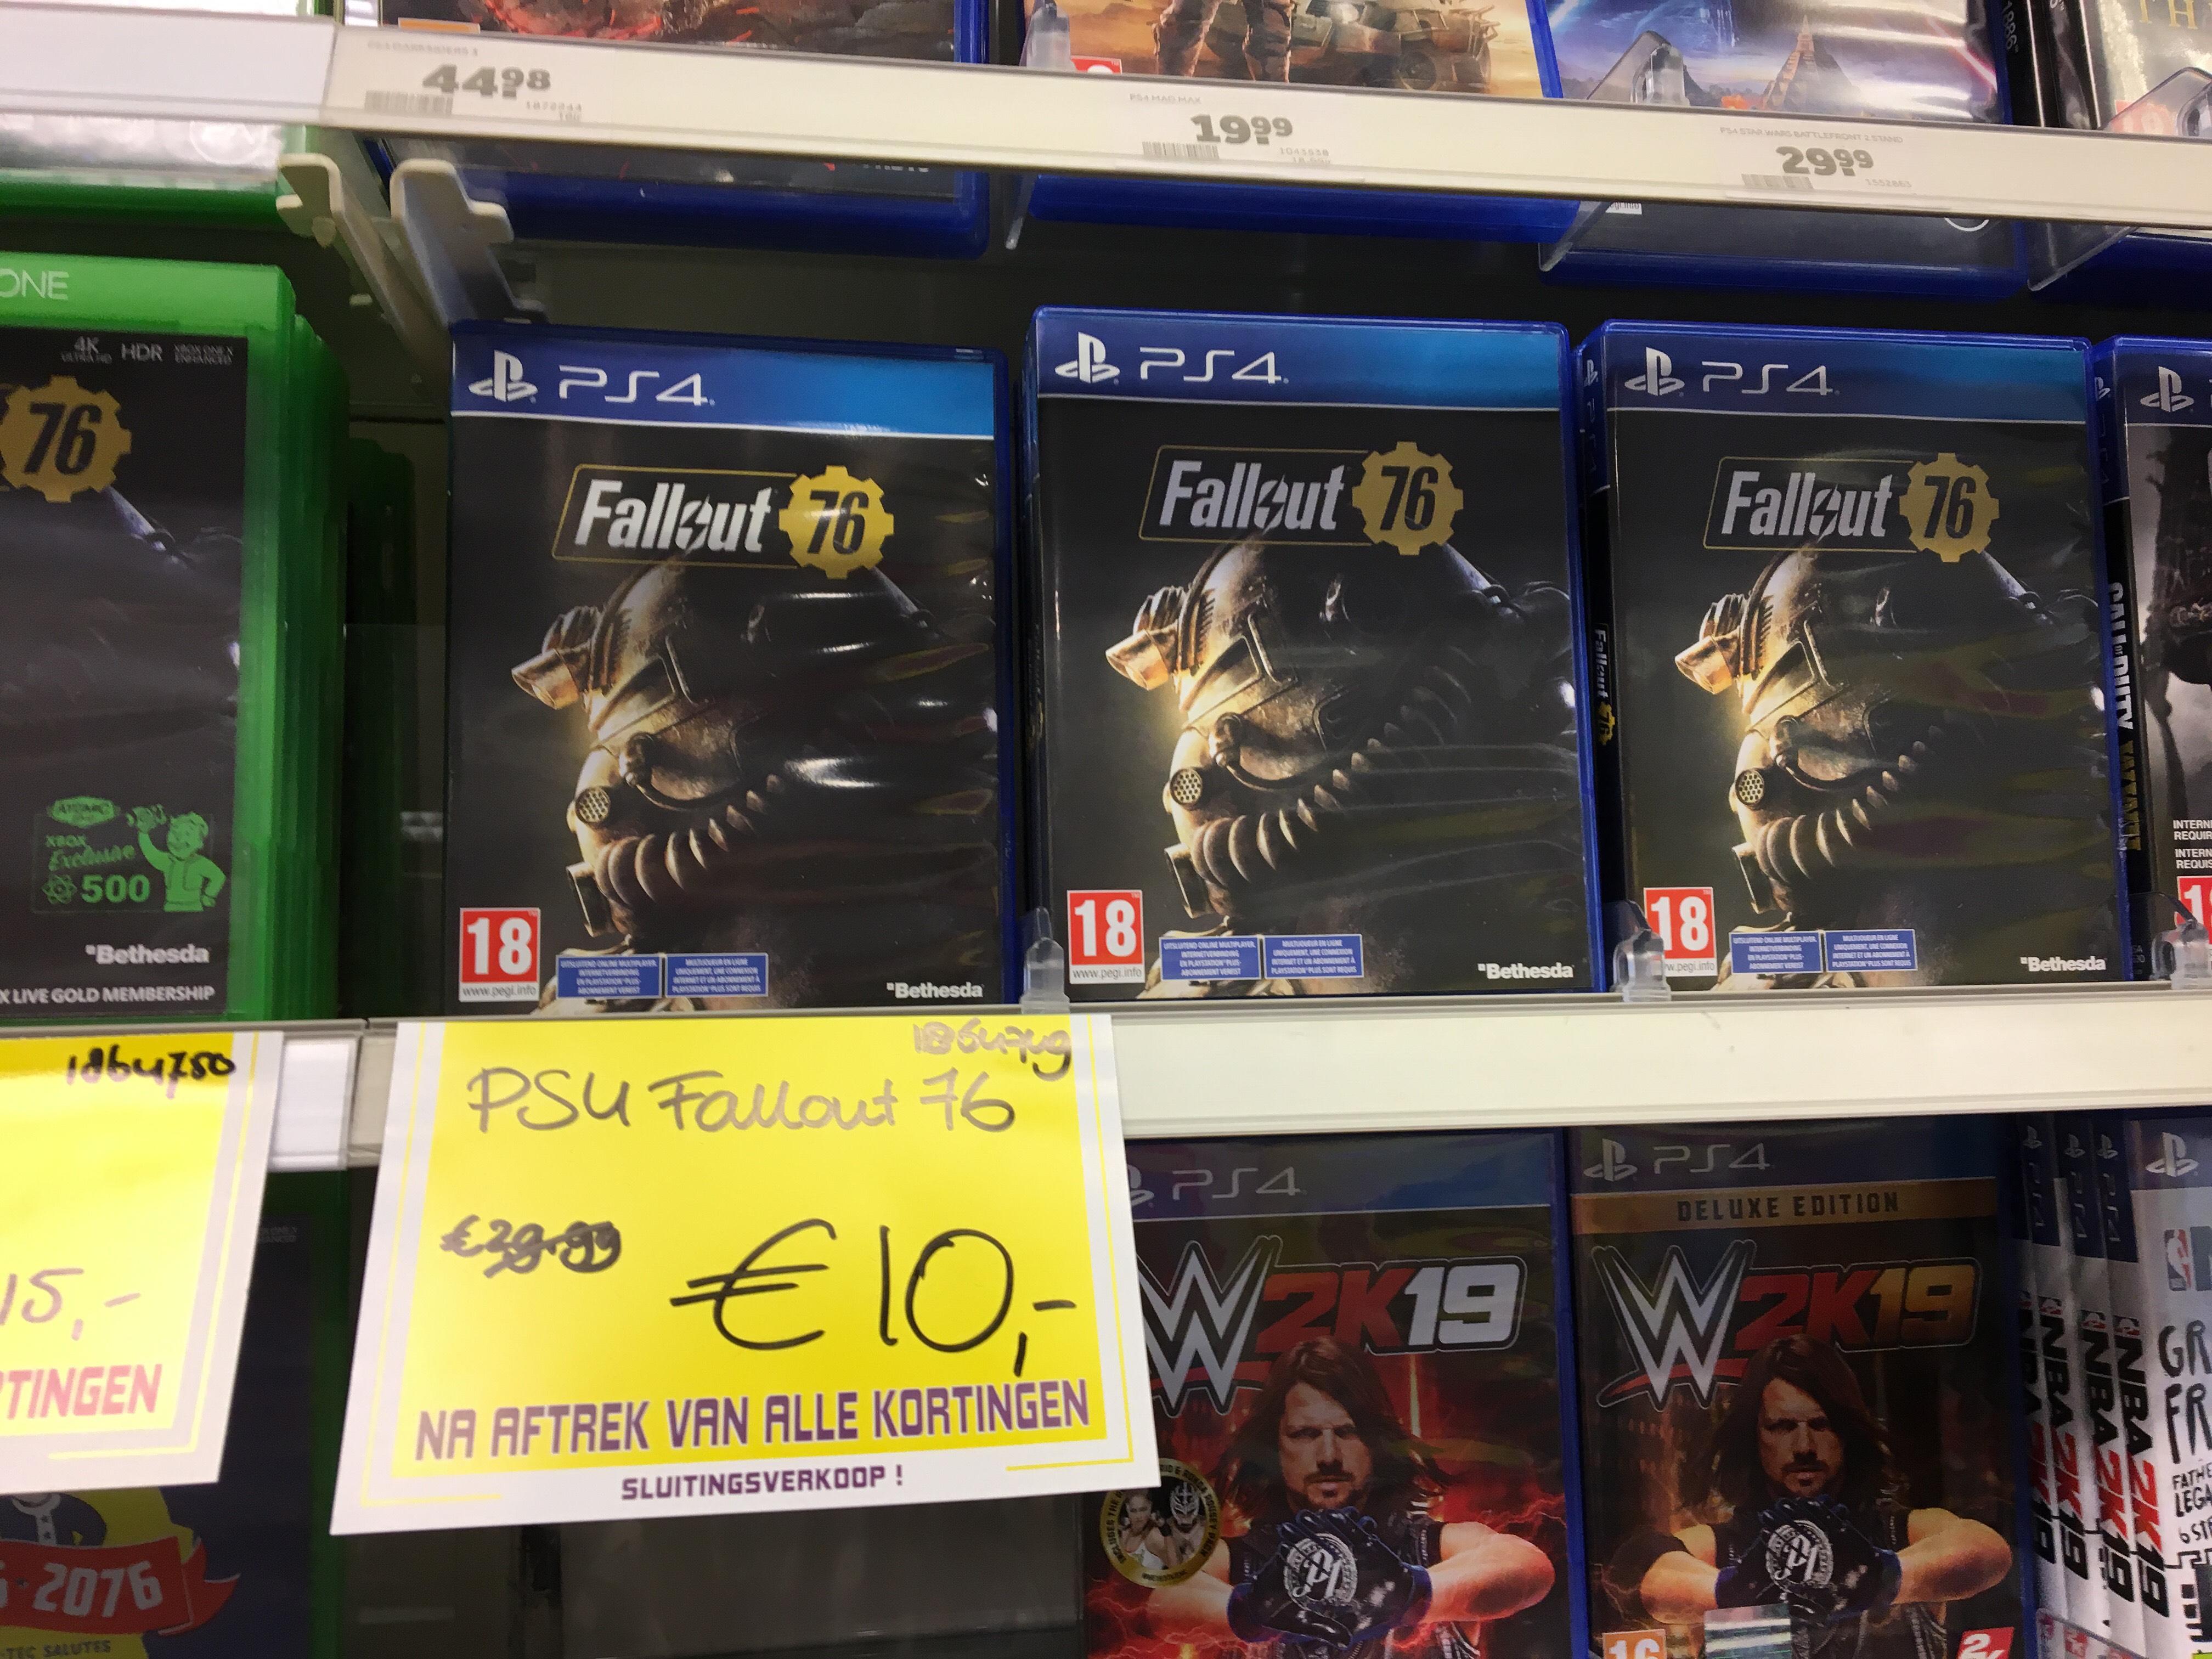 Fallout 76 - PS4 (Intertoys)